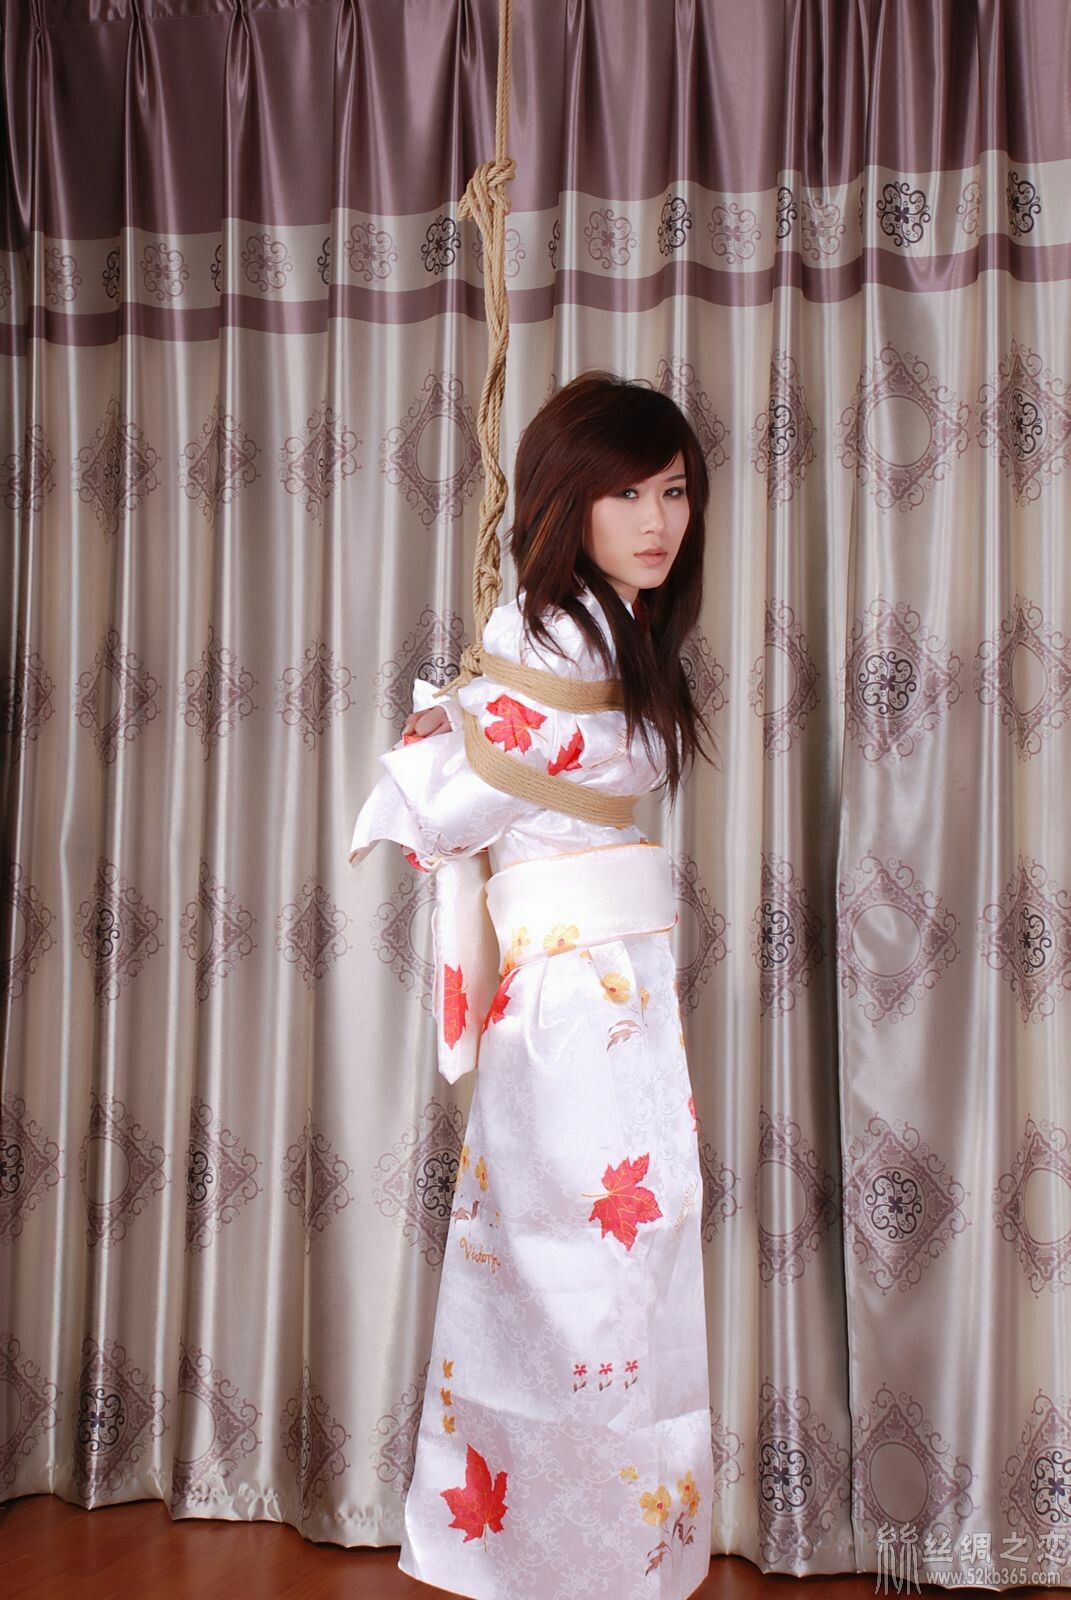 52kb 丝绸和服麻绳束缚02 bondage-kimono-59.jpg  丝绸物品爱好者 234950wo4tj4qqwqqmj6d1